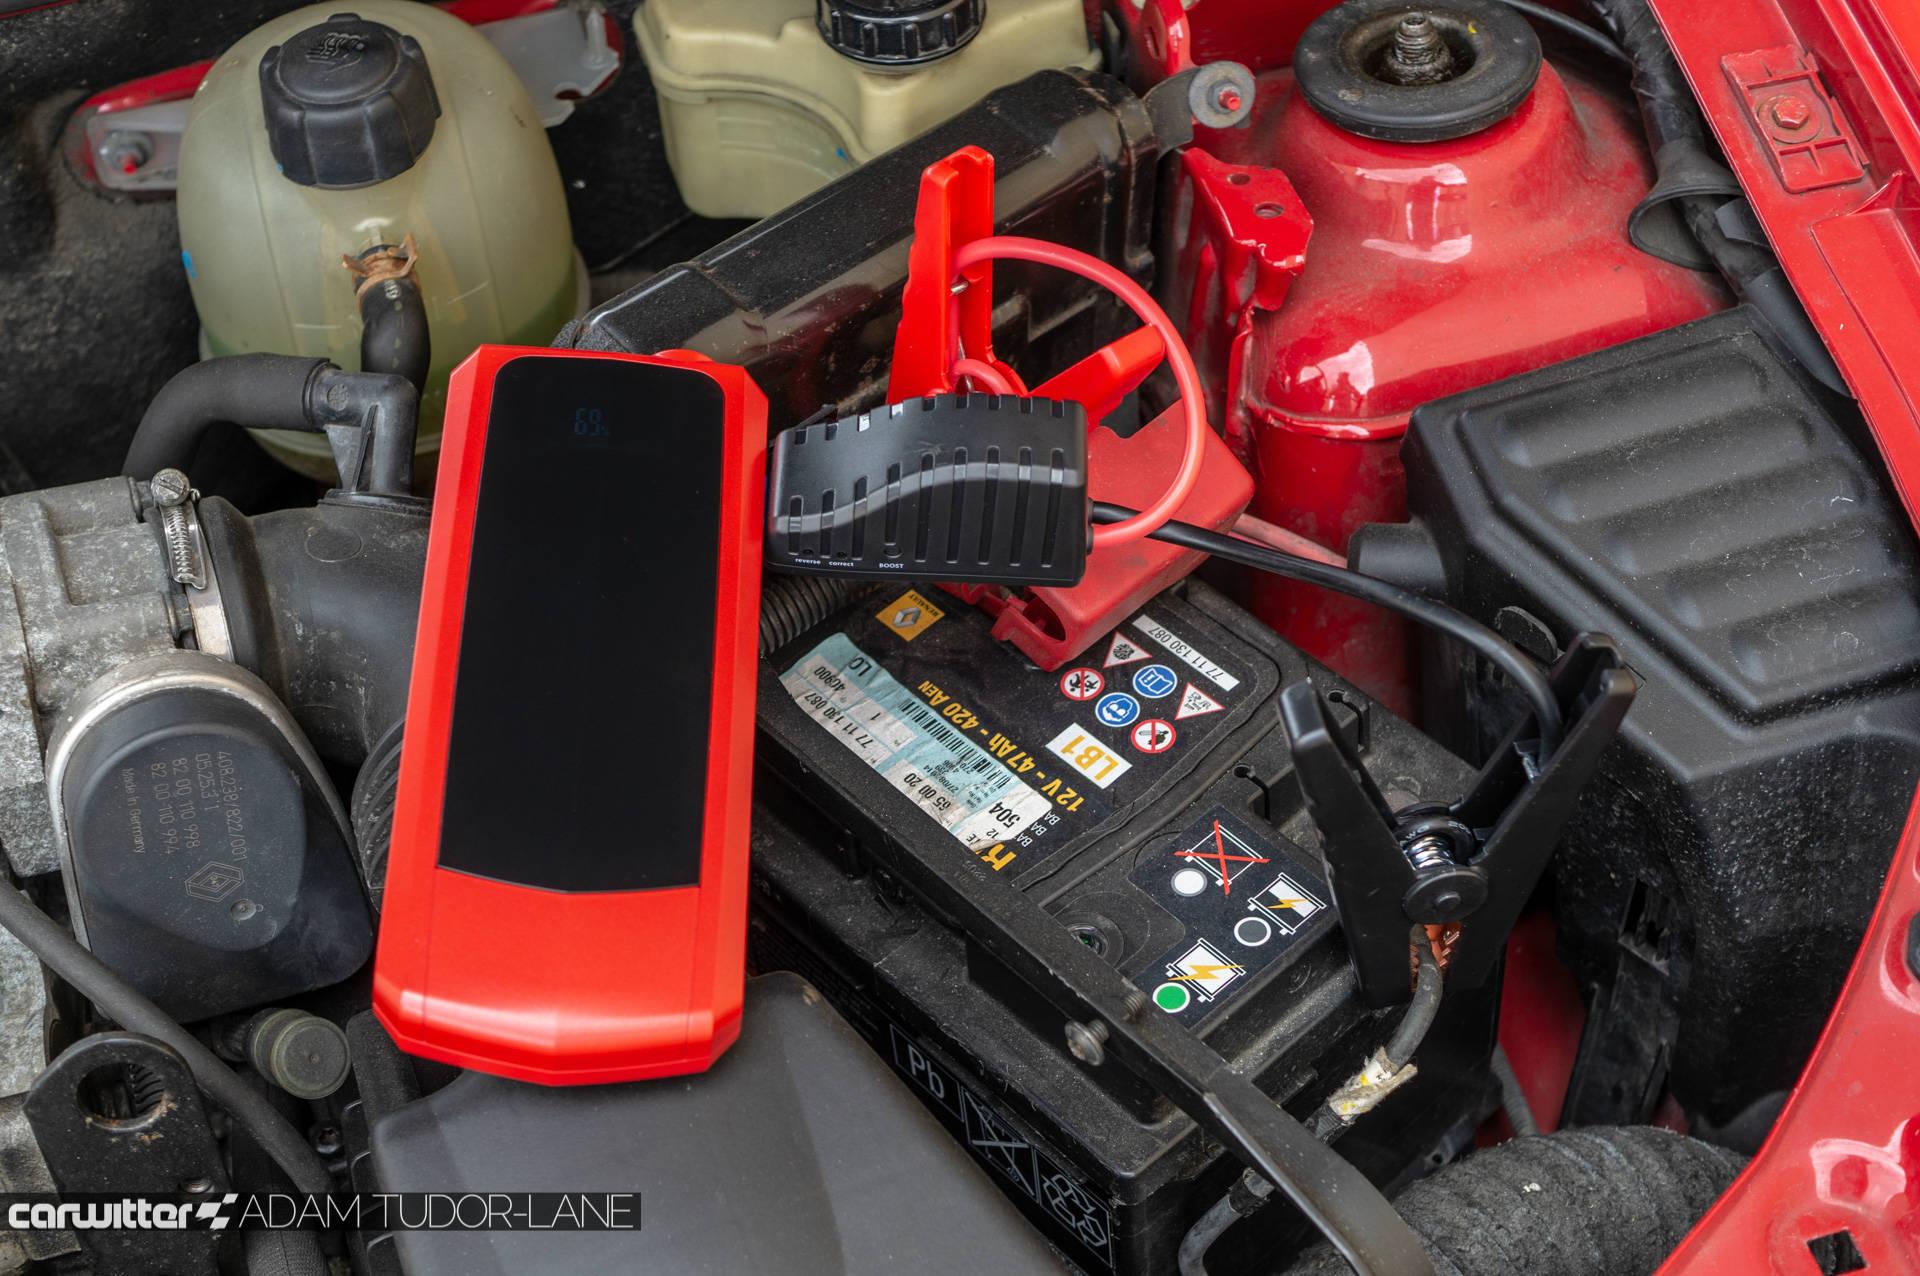 Audew Car Jump Starter Battery Pack 20000 mAh - carwitter